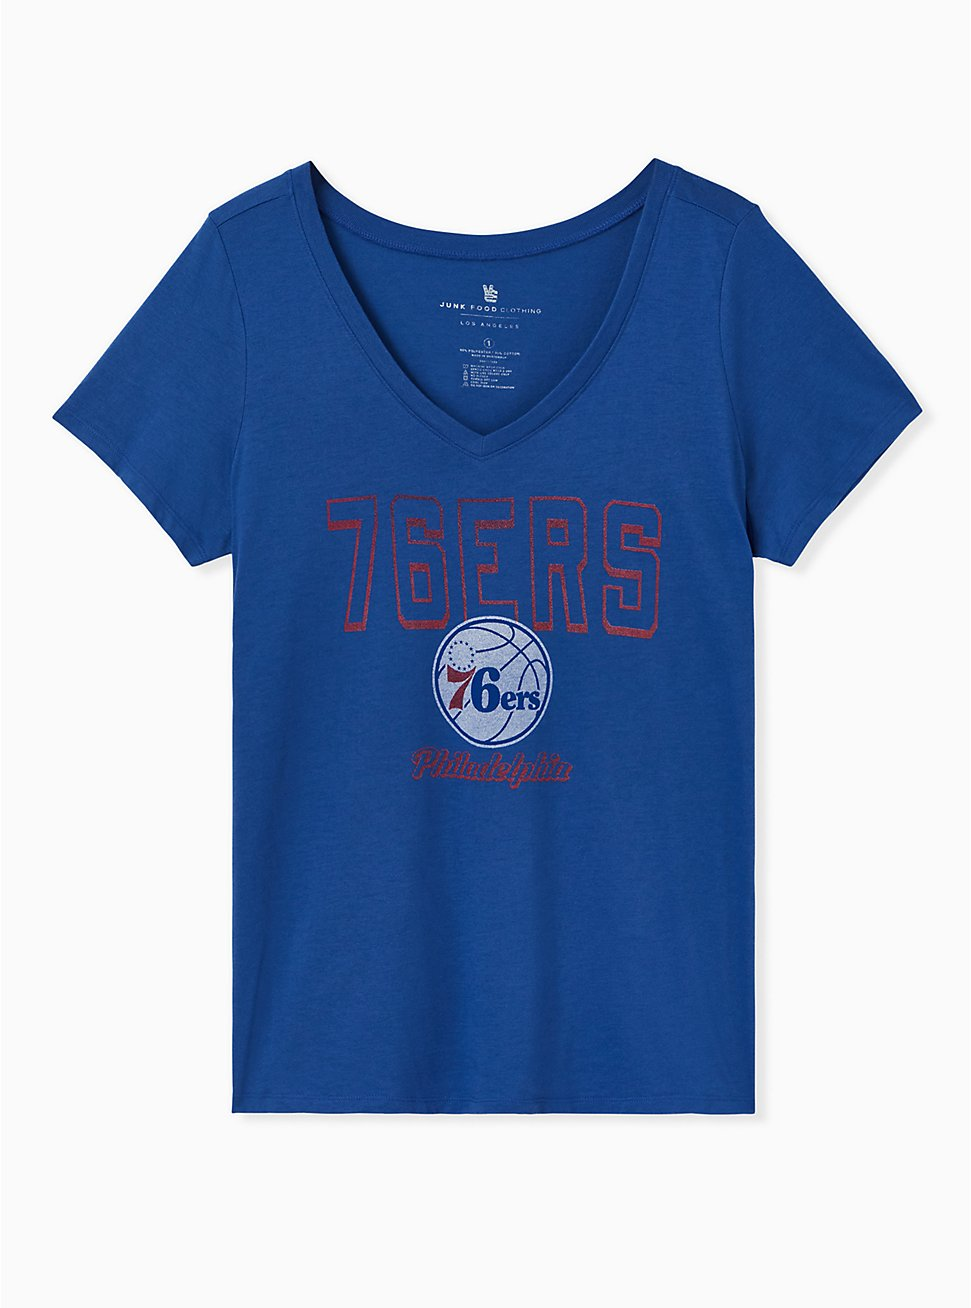 NBA Philadelphia 76ers V-Neck Tee - Blue, , hi-res